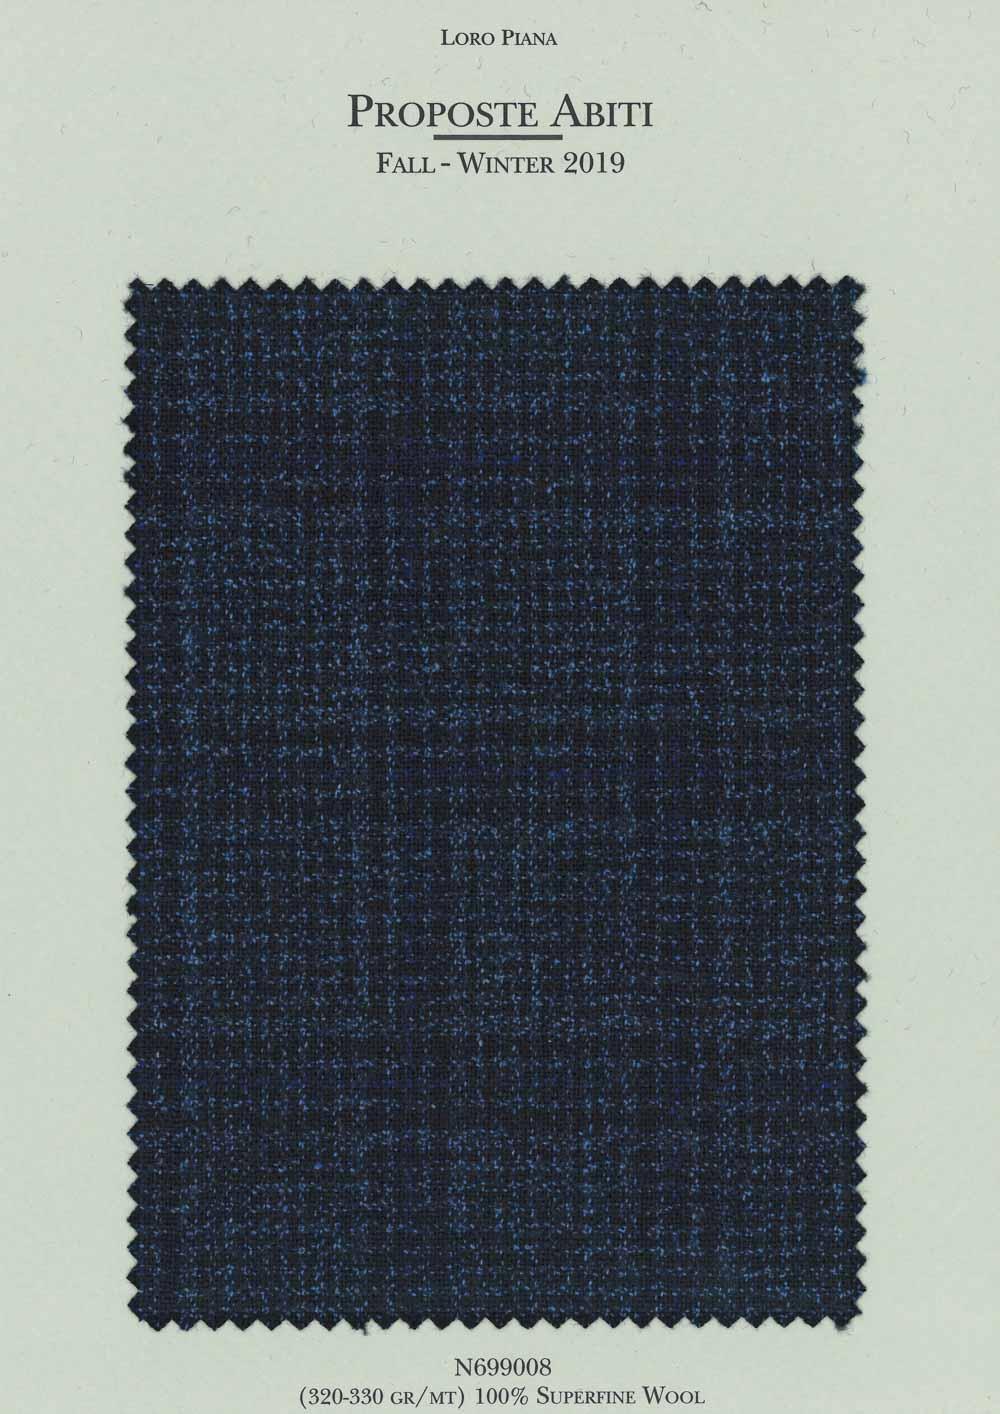 Lpn699008